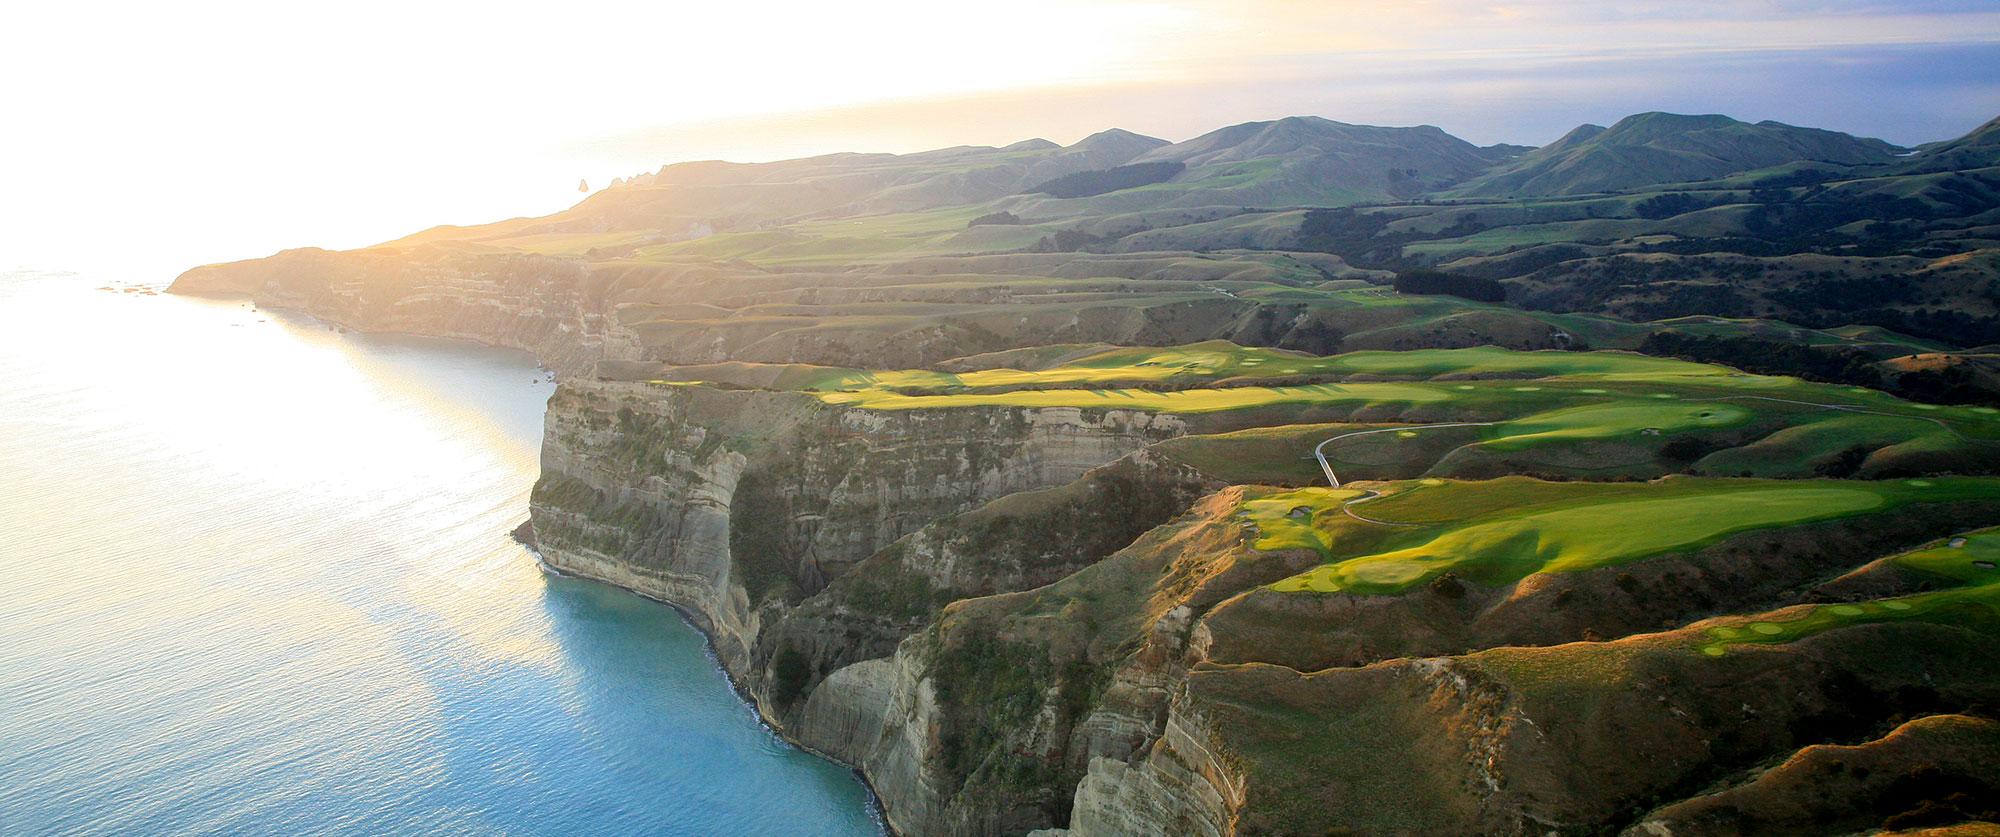 golf trips - golf - golf travel - handcrafted